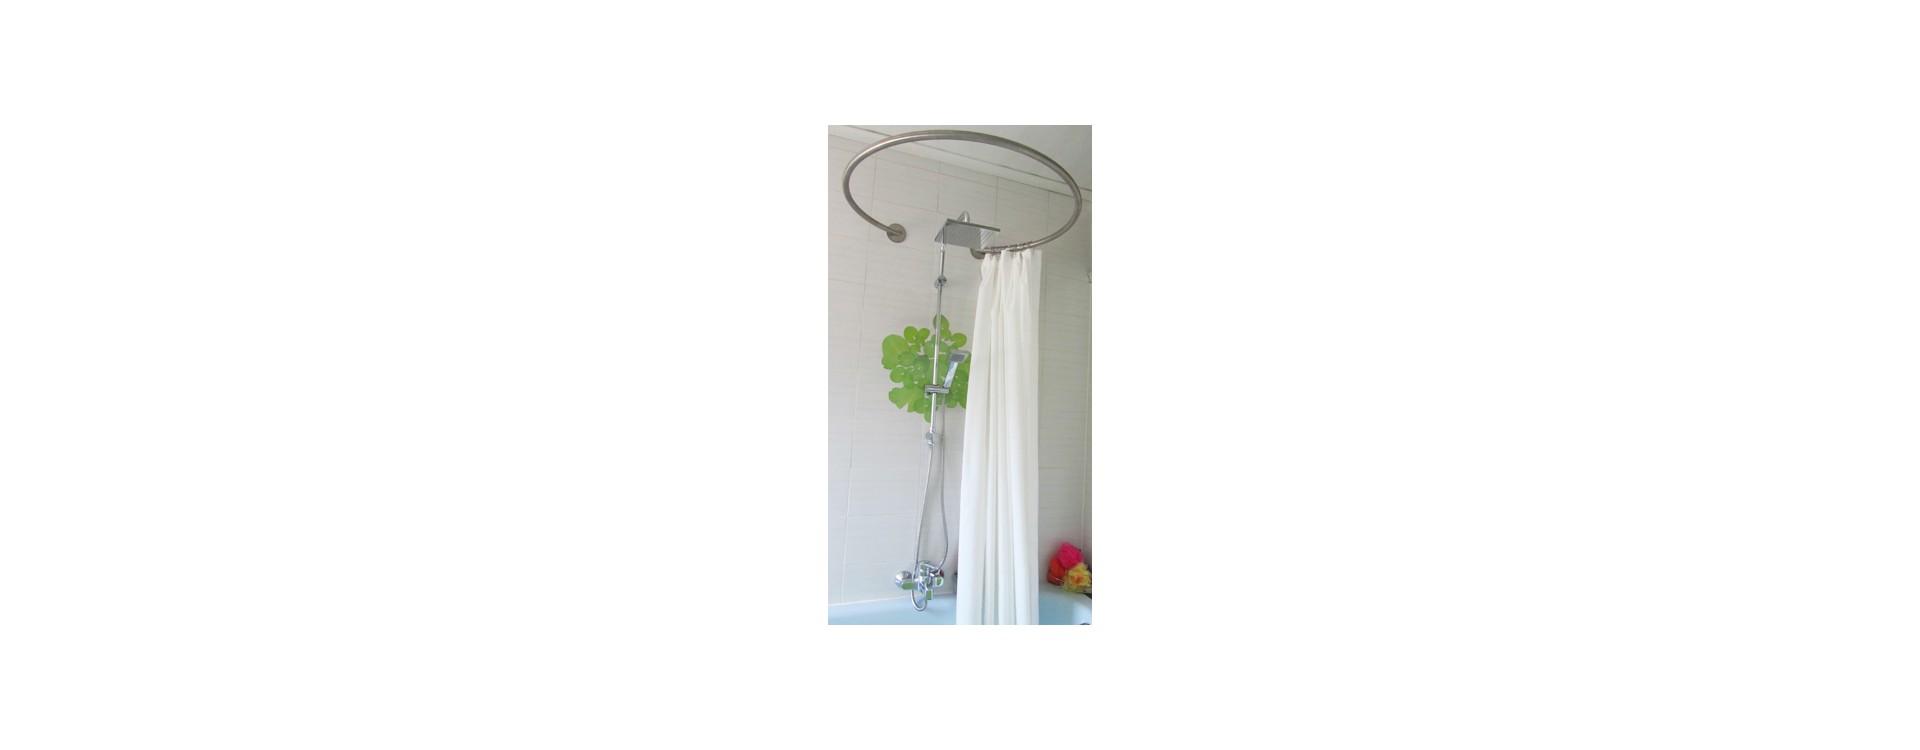 galbobain paroi de douche textile circulaire pour baignoire galbobain. Black Bedroom Furniture Sets. Home Design Ideas